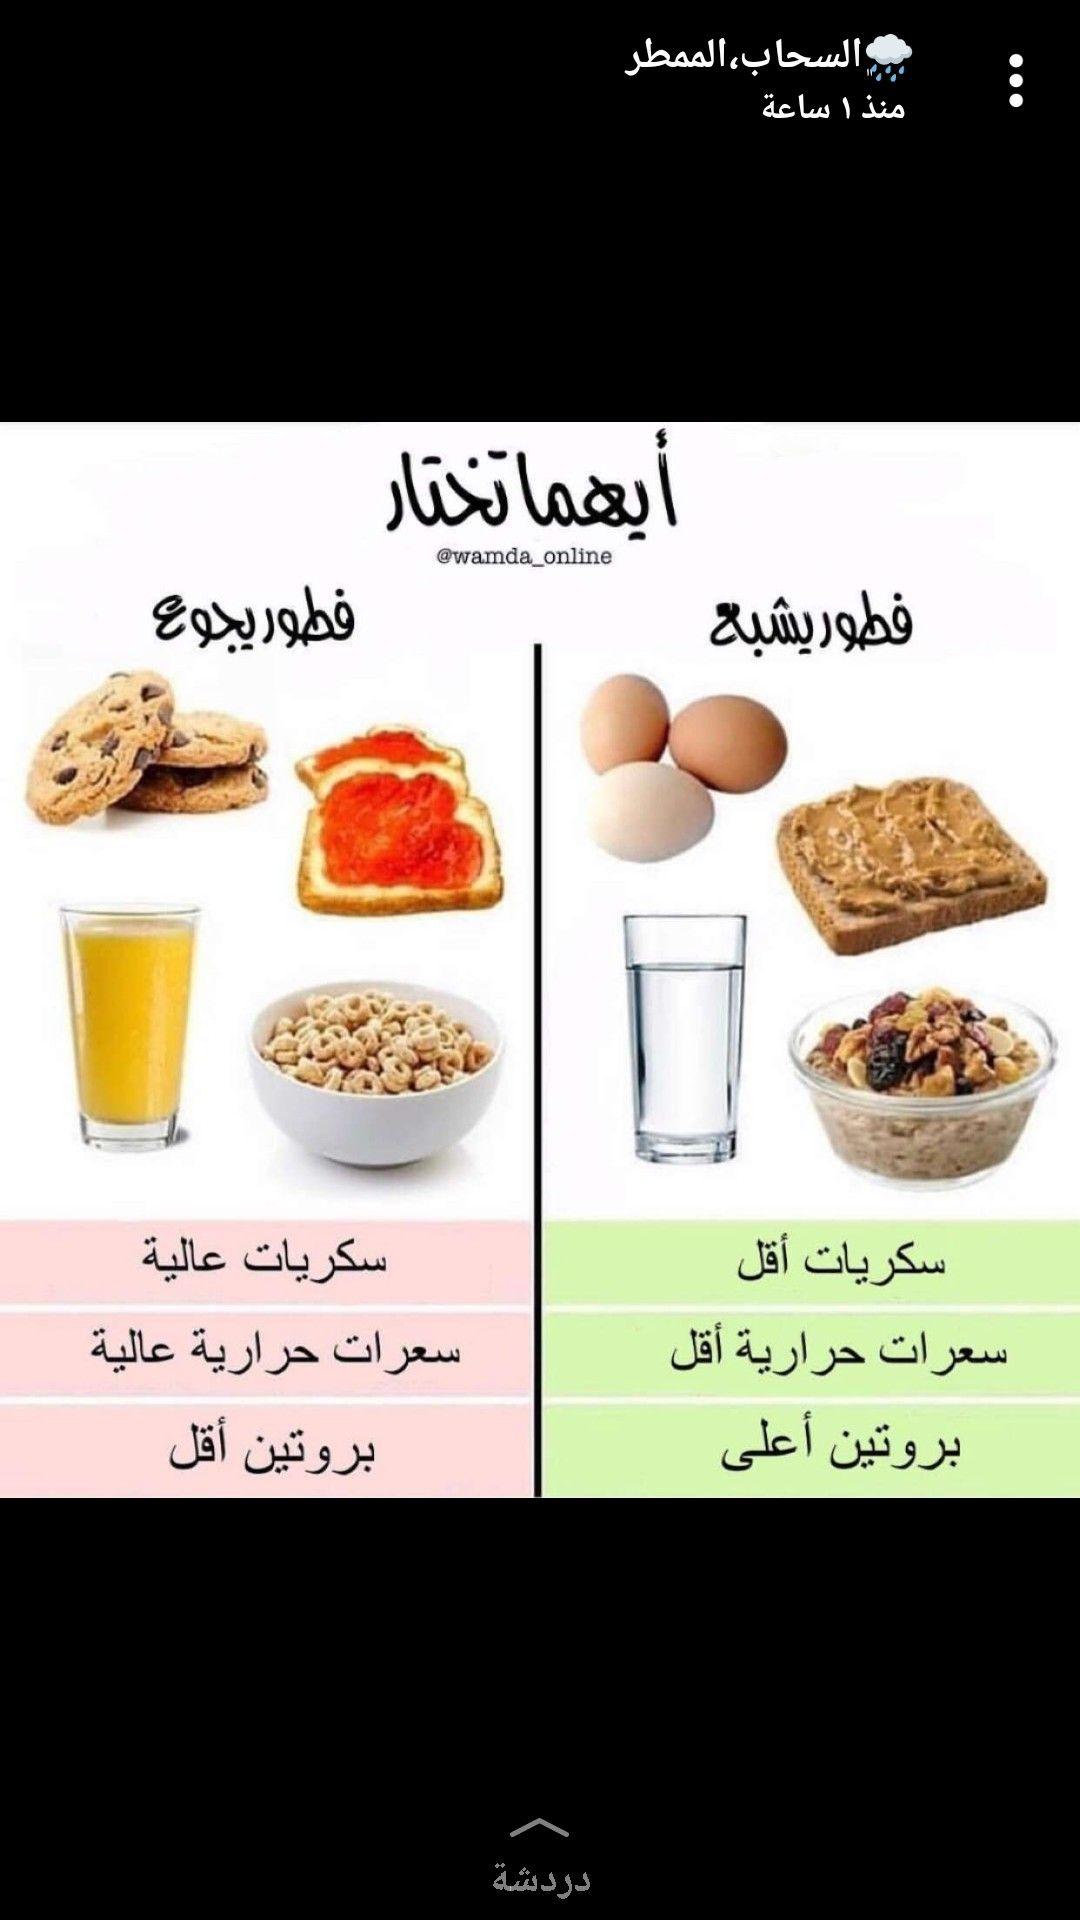 Pin By Zaaha 23 On صحة الجسم Health Fitness Food Health Facts Food Health Fitness Nutrition